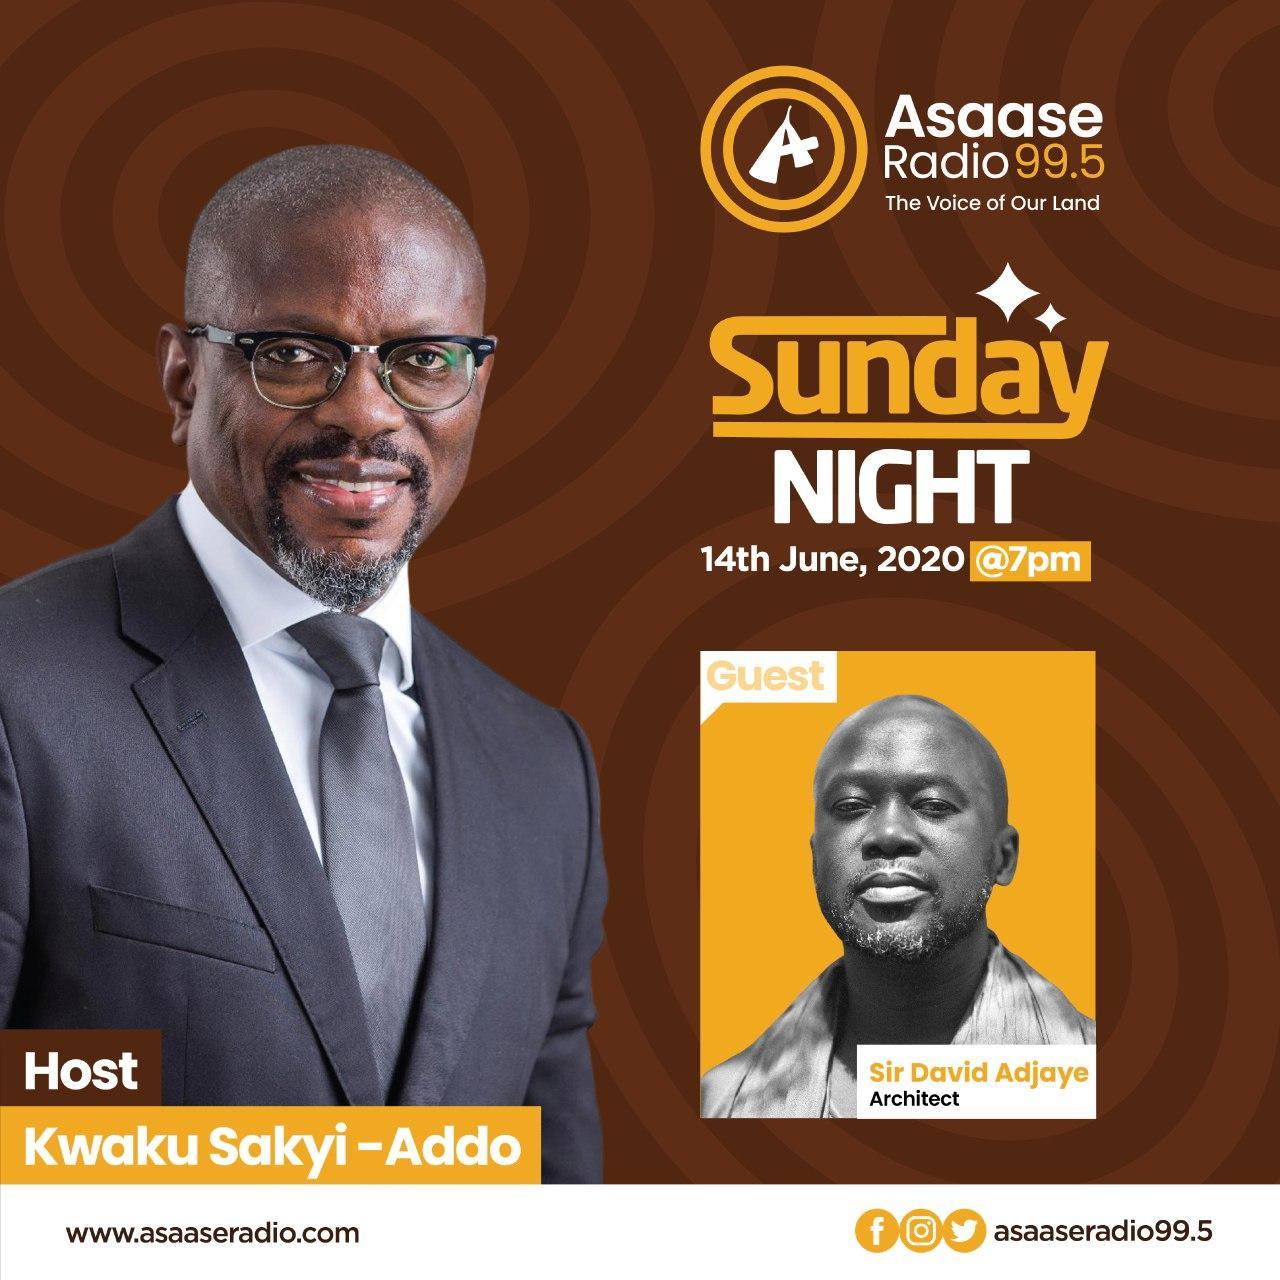 Kwaku Sakyi-Addo hosts Sir David Adjaye on 'Sunday Night' on Asaase Radio